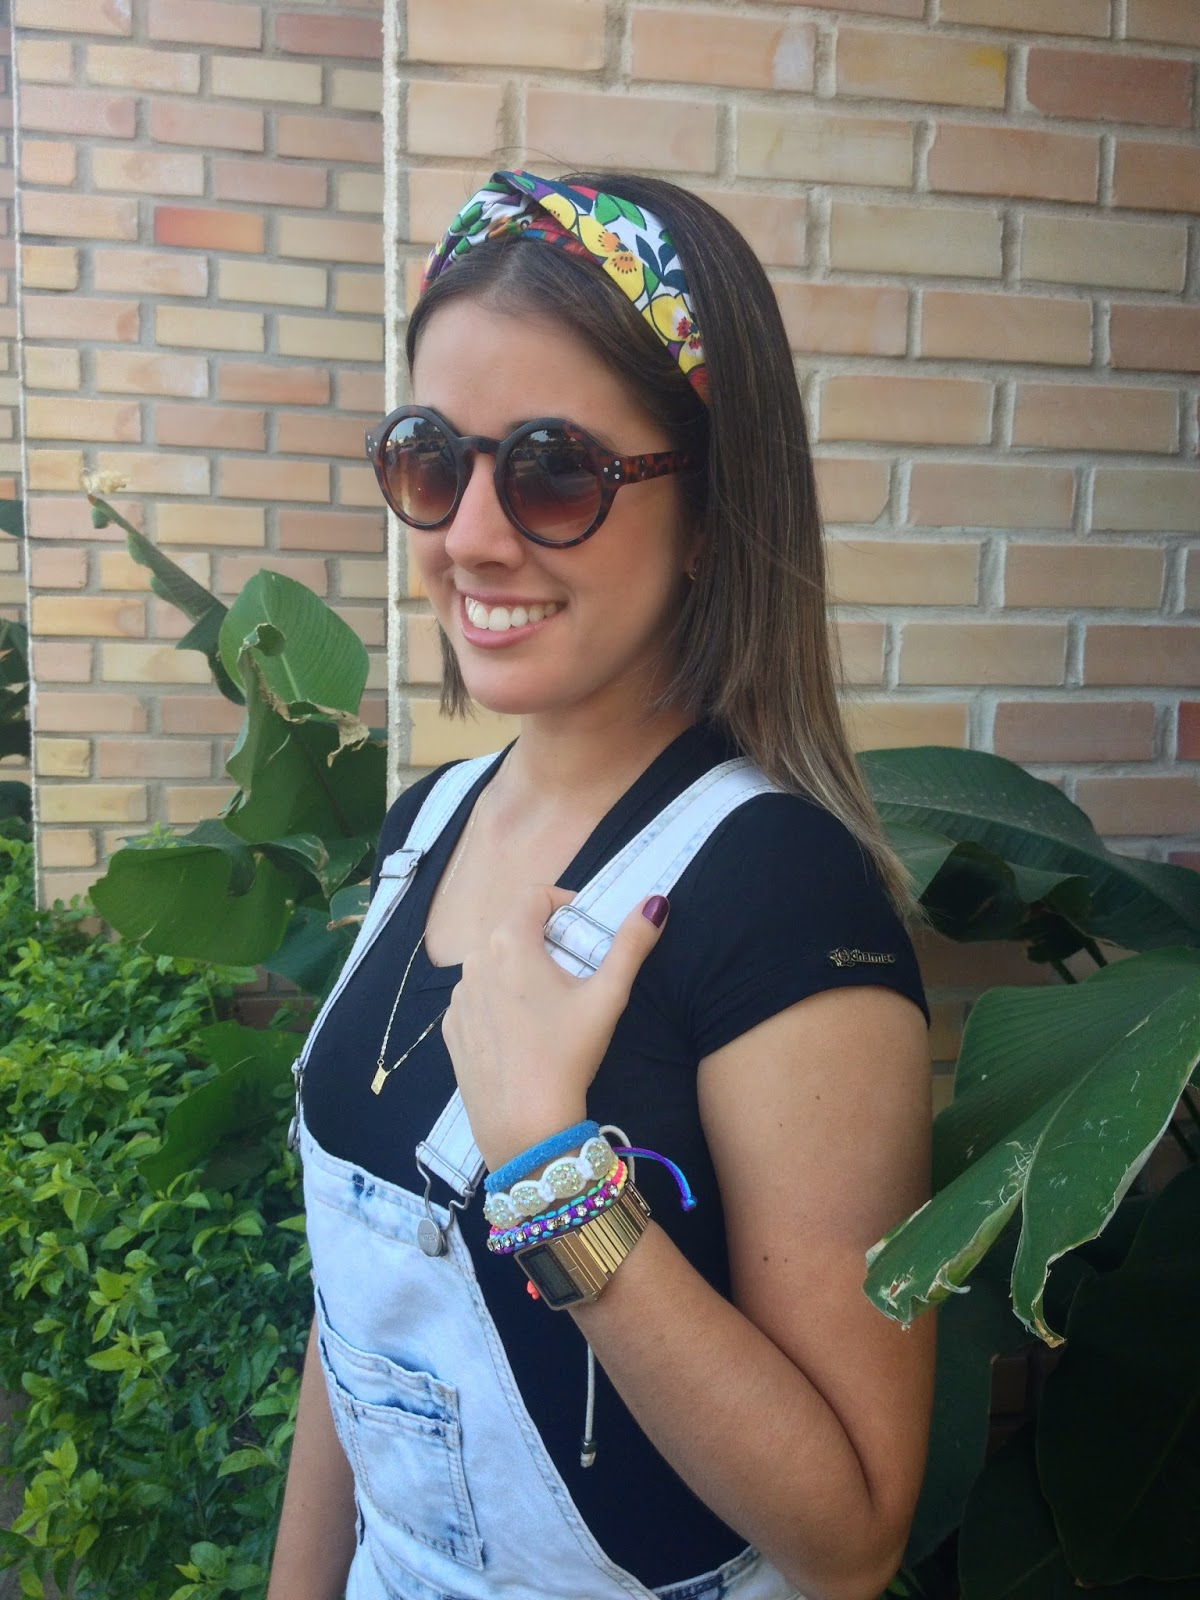 Bandana  Miss Bella   Óculos  Bazar Futuro   Camisa  Sem marca...    Macacão  Ripley   Alpargata  Hang Loose 64b28116eb